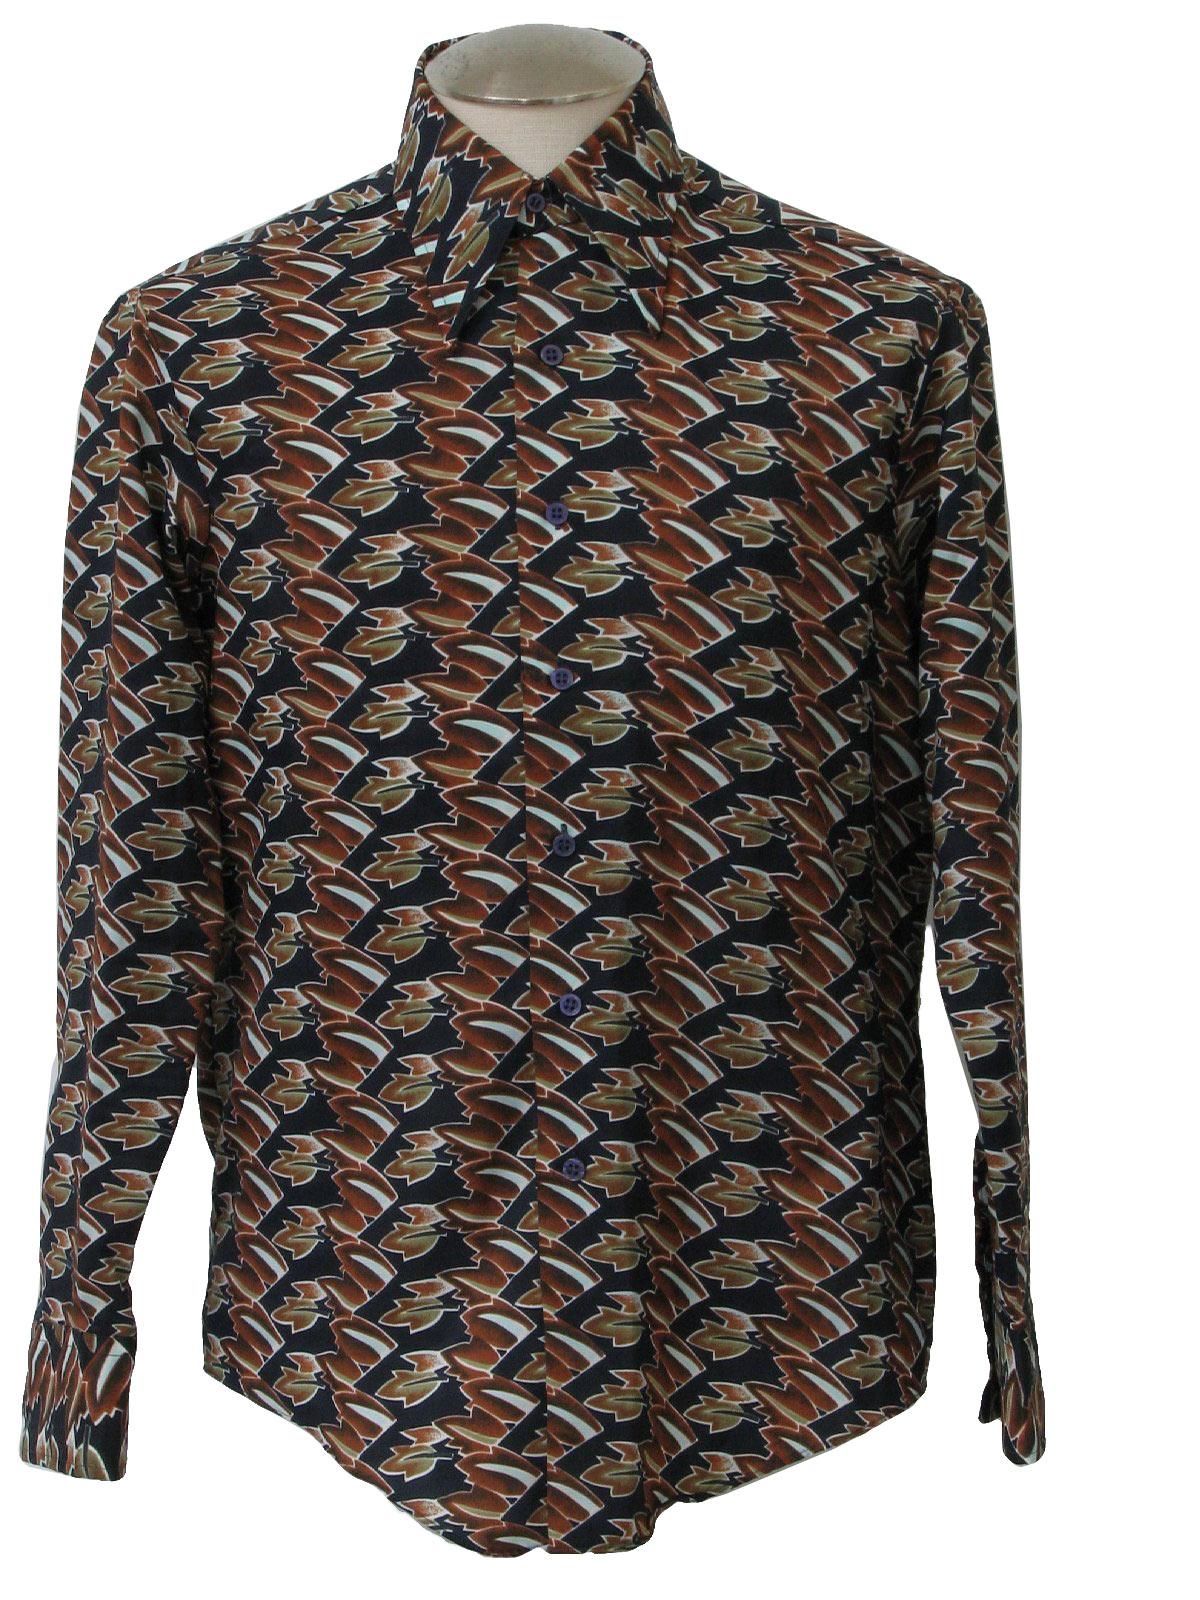 Seventies kmart print disco shirt 70s kmart mens navy for Kmart button up shirts